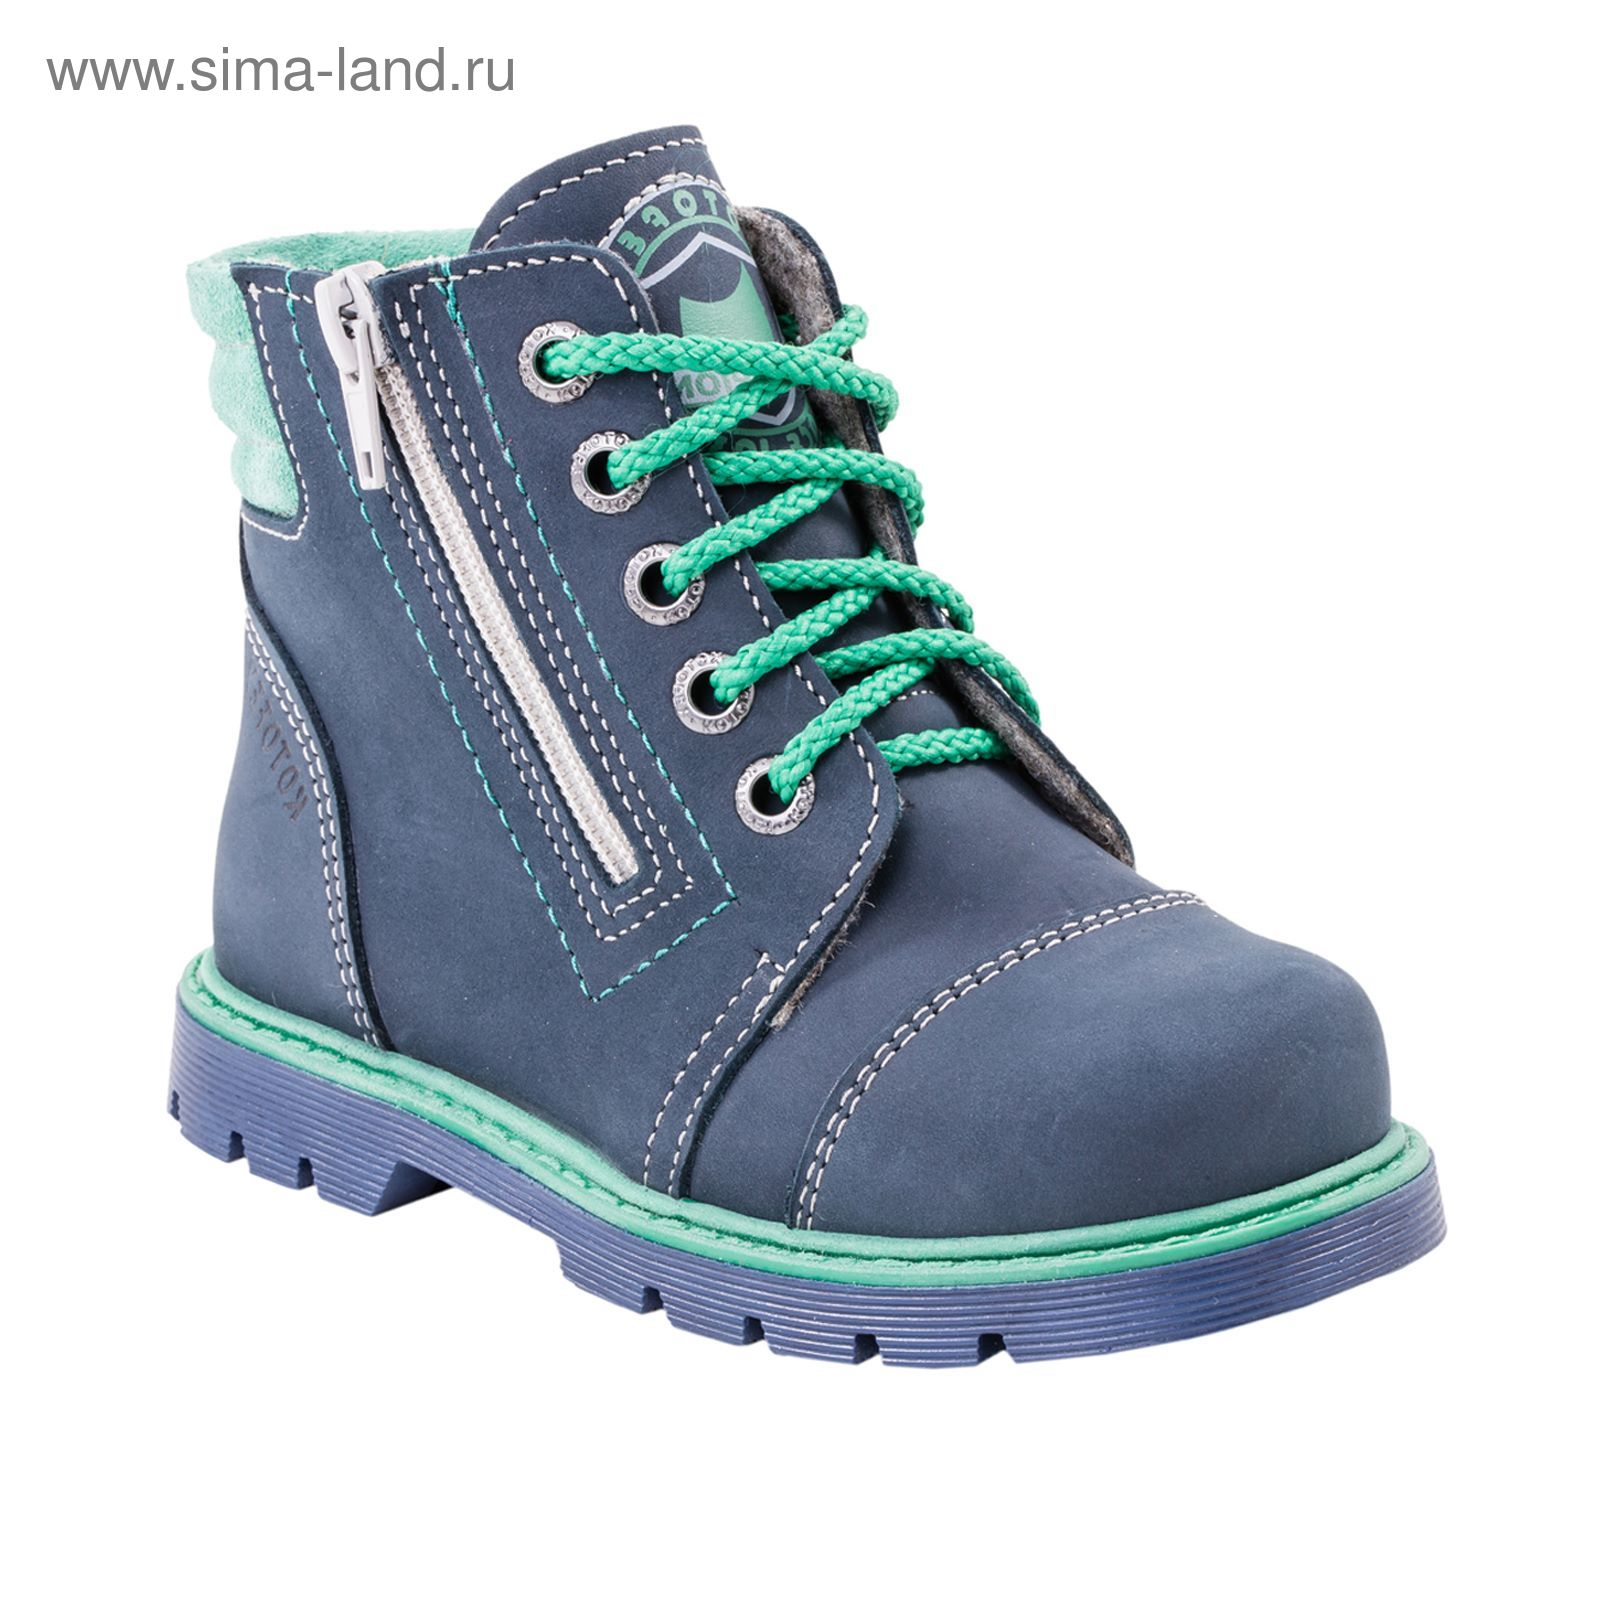 bac1dff01 Ботинки